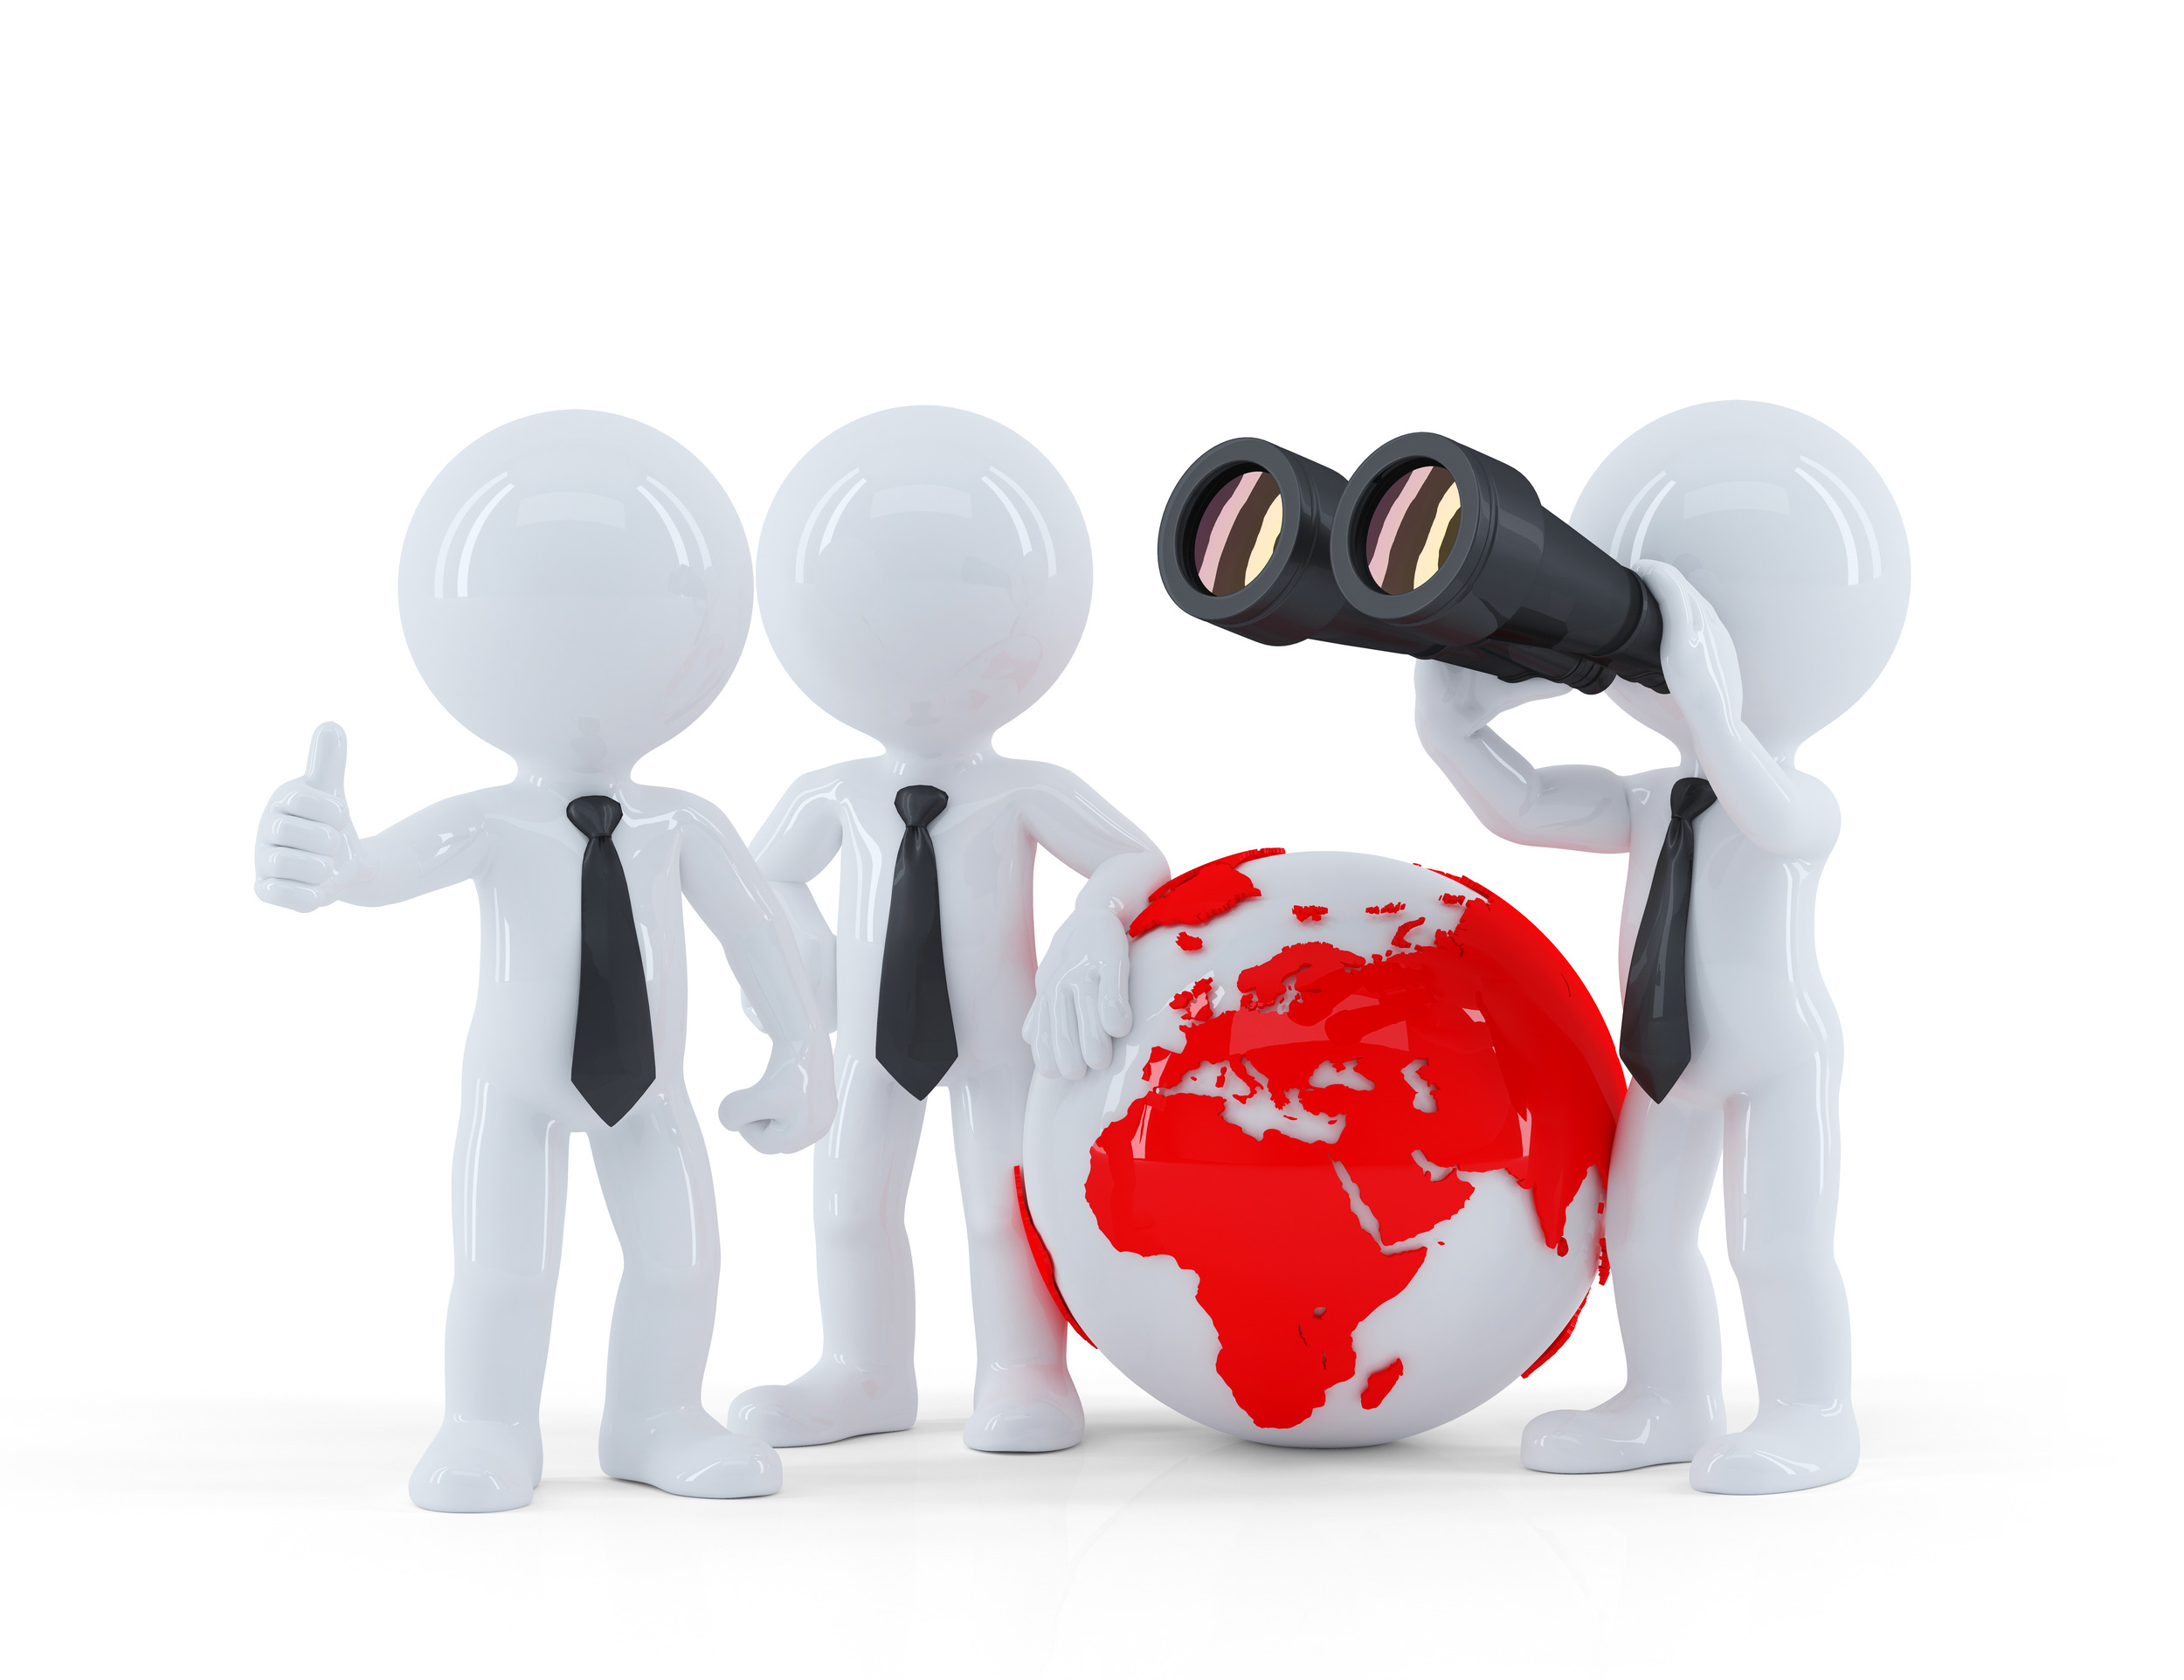 group-of-businesspeople-with-globe-and-binoculars_fywAKtCd.jpg